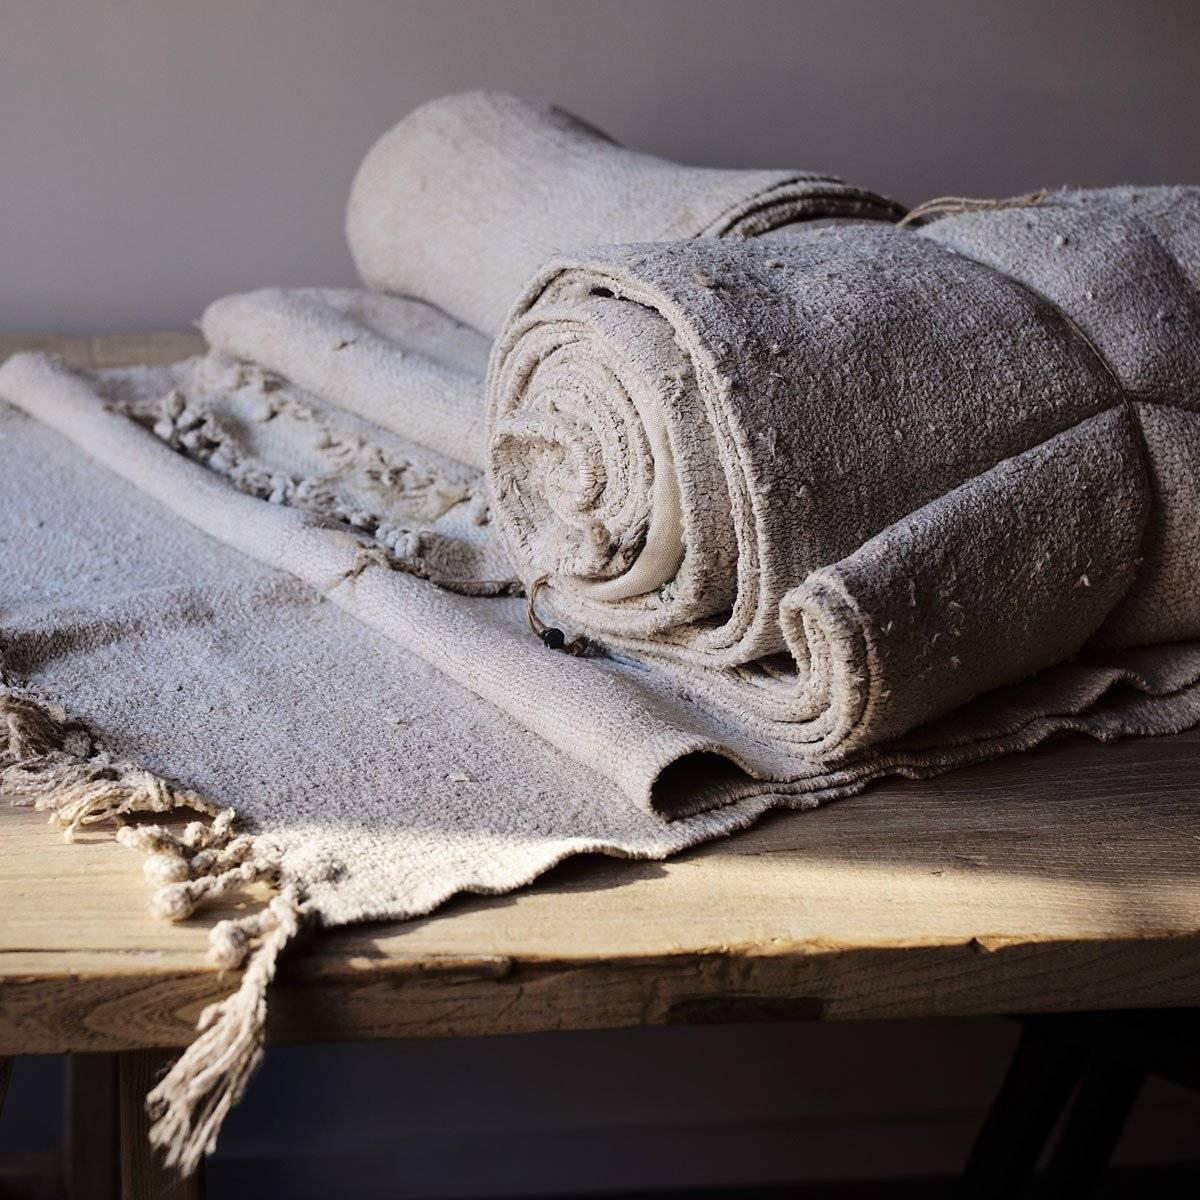 The Truth About Hemp Textiles, Hemp Fabric, Hemp Rolled Fabric